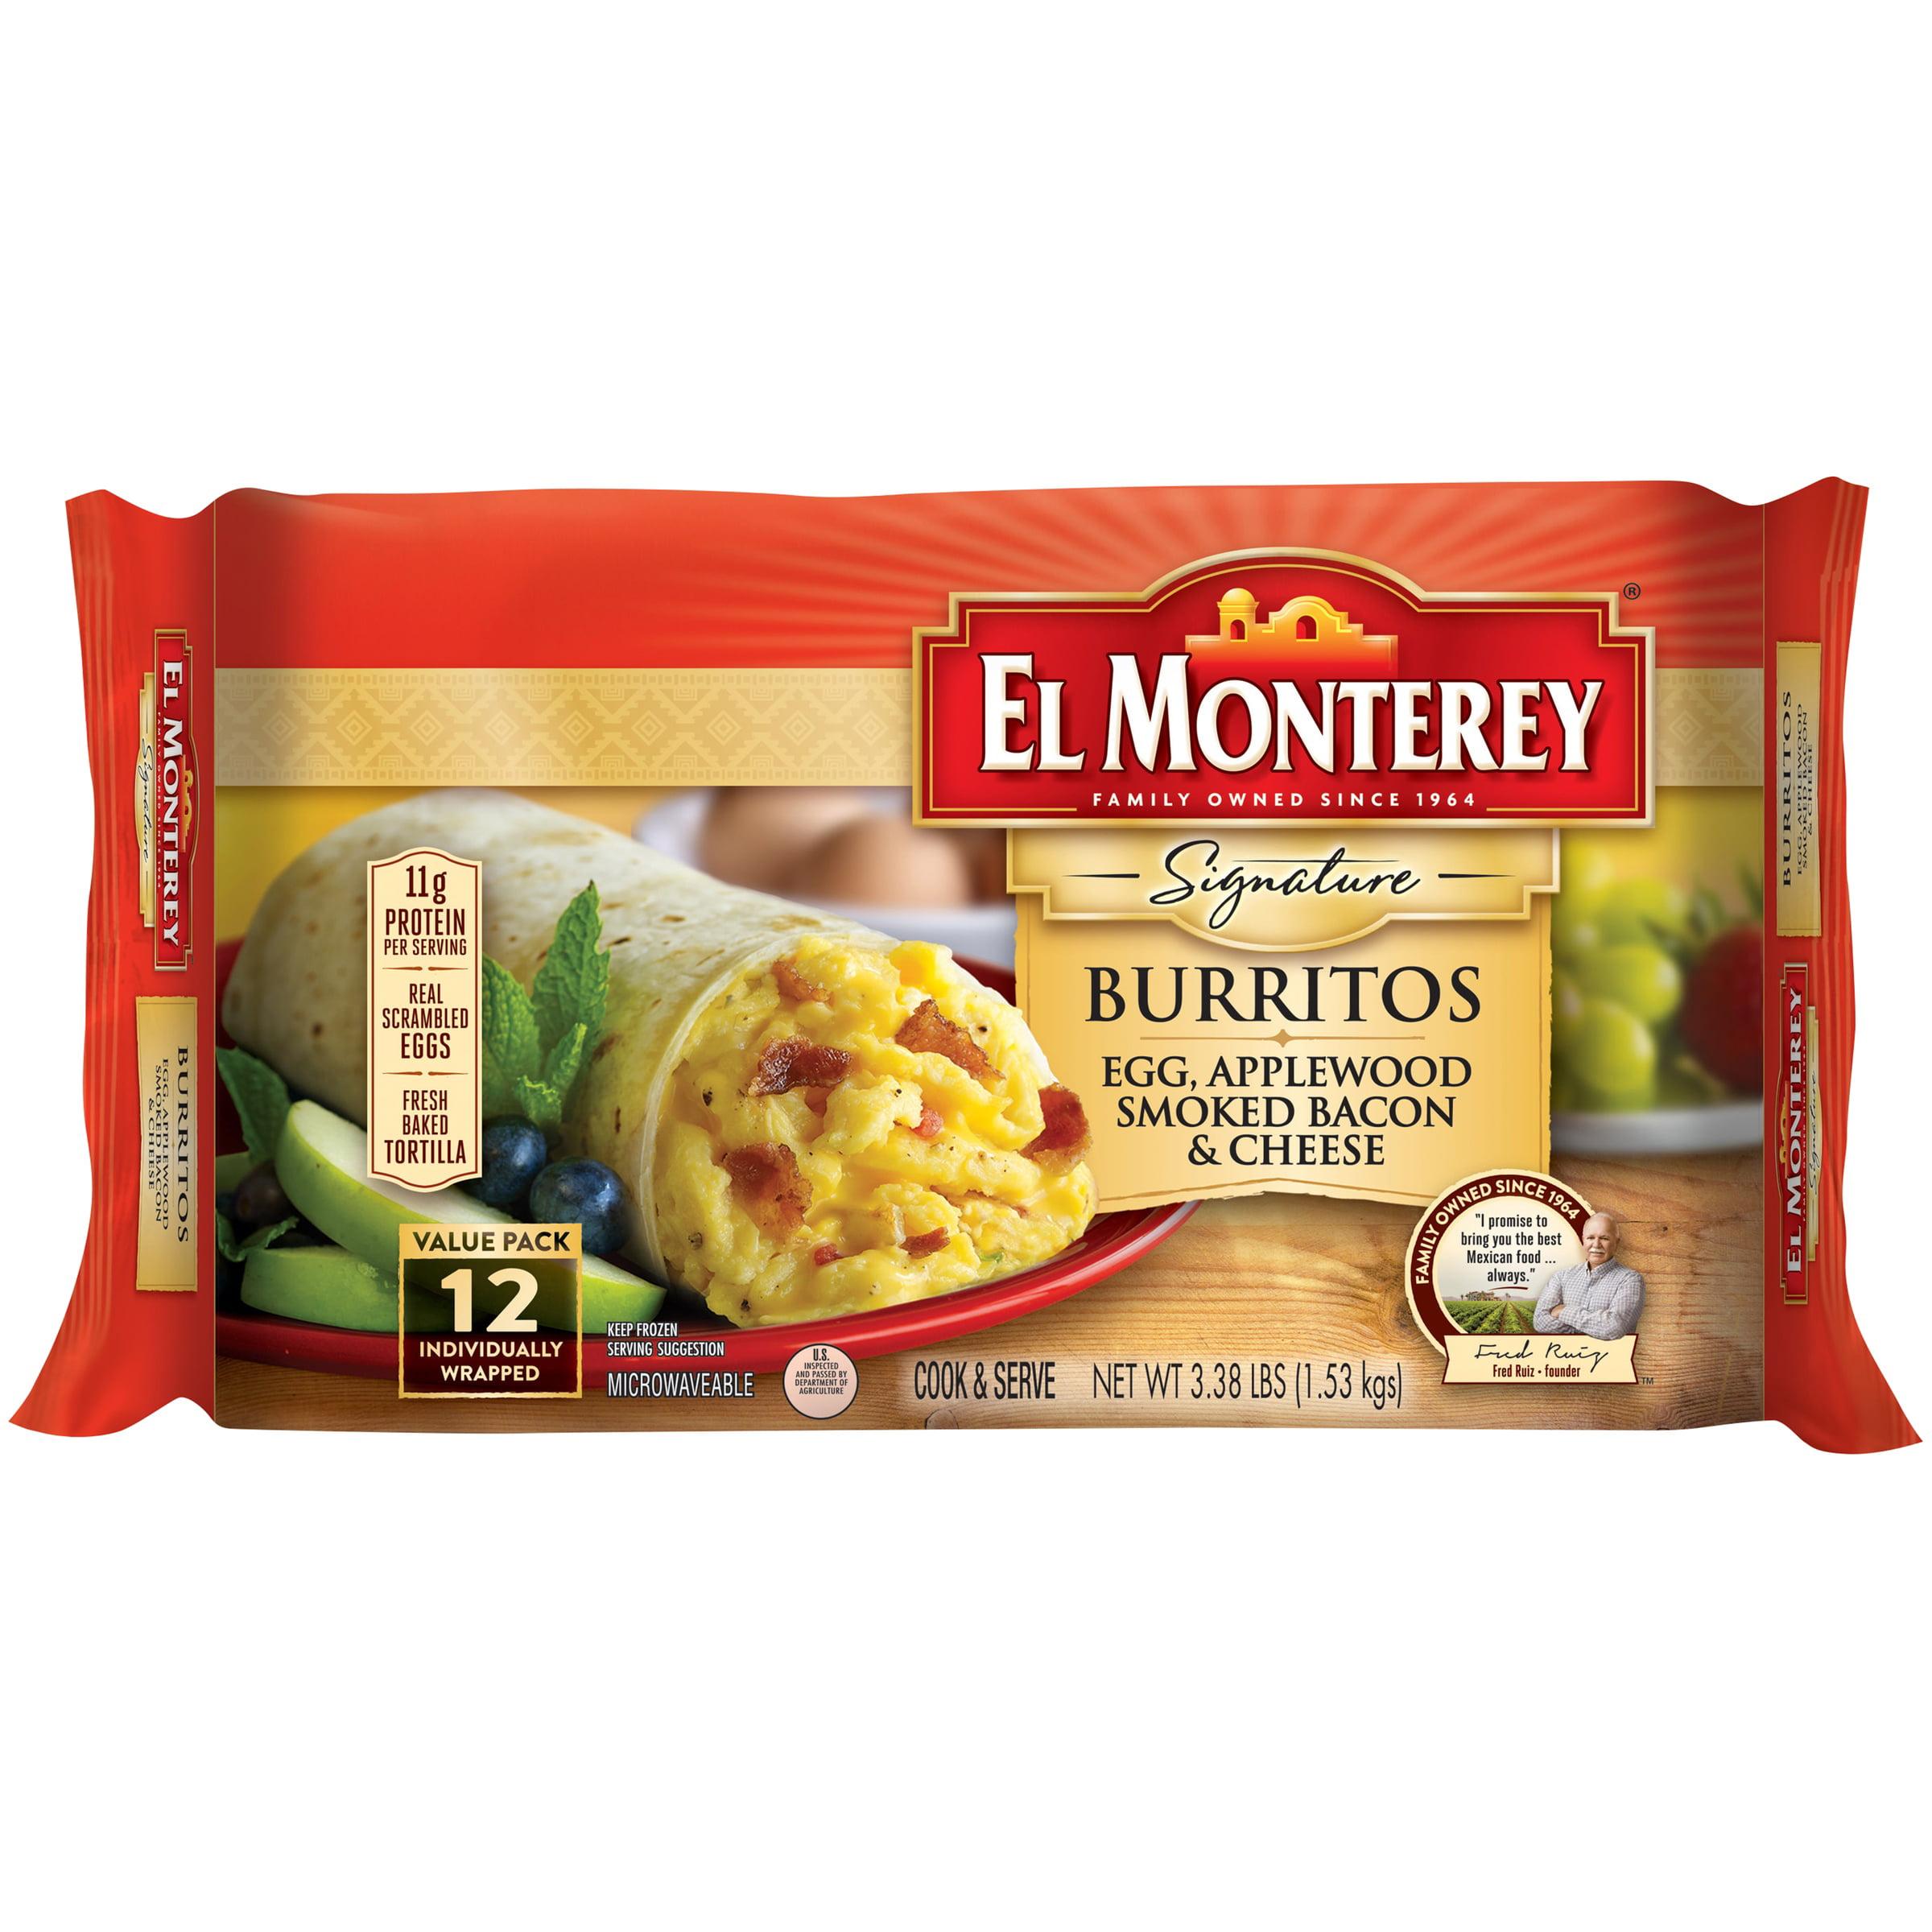 El Monterey® Signature Egg Applewood Smoked Bacon & Cheese Burritos 12 ct Bag